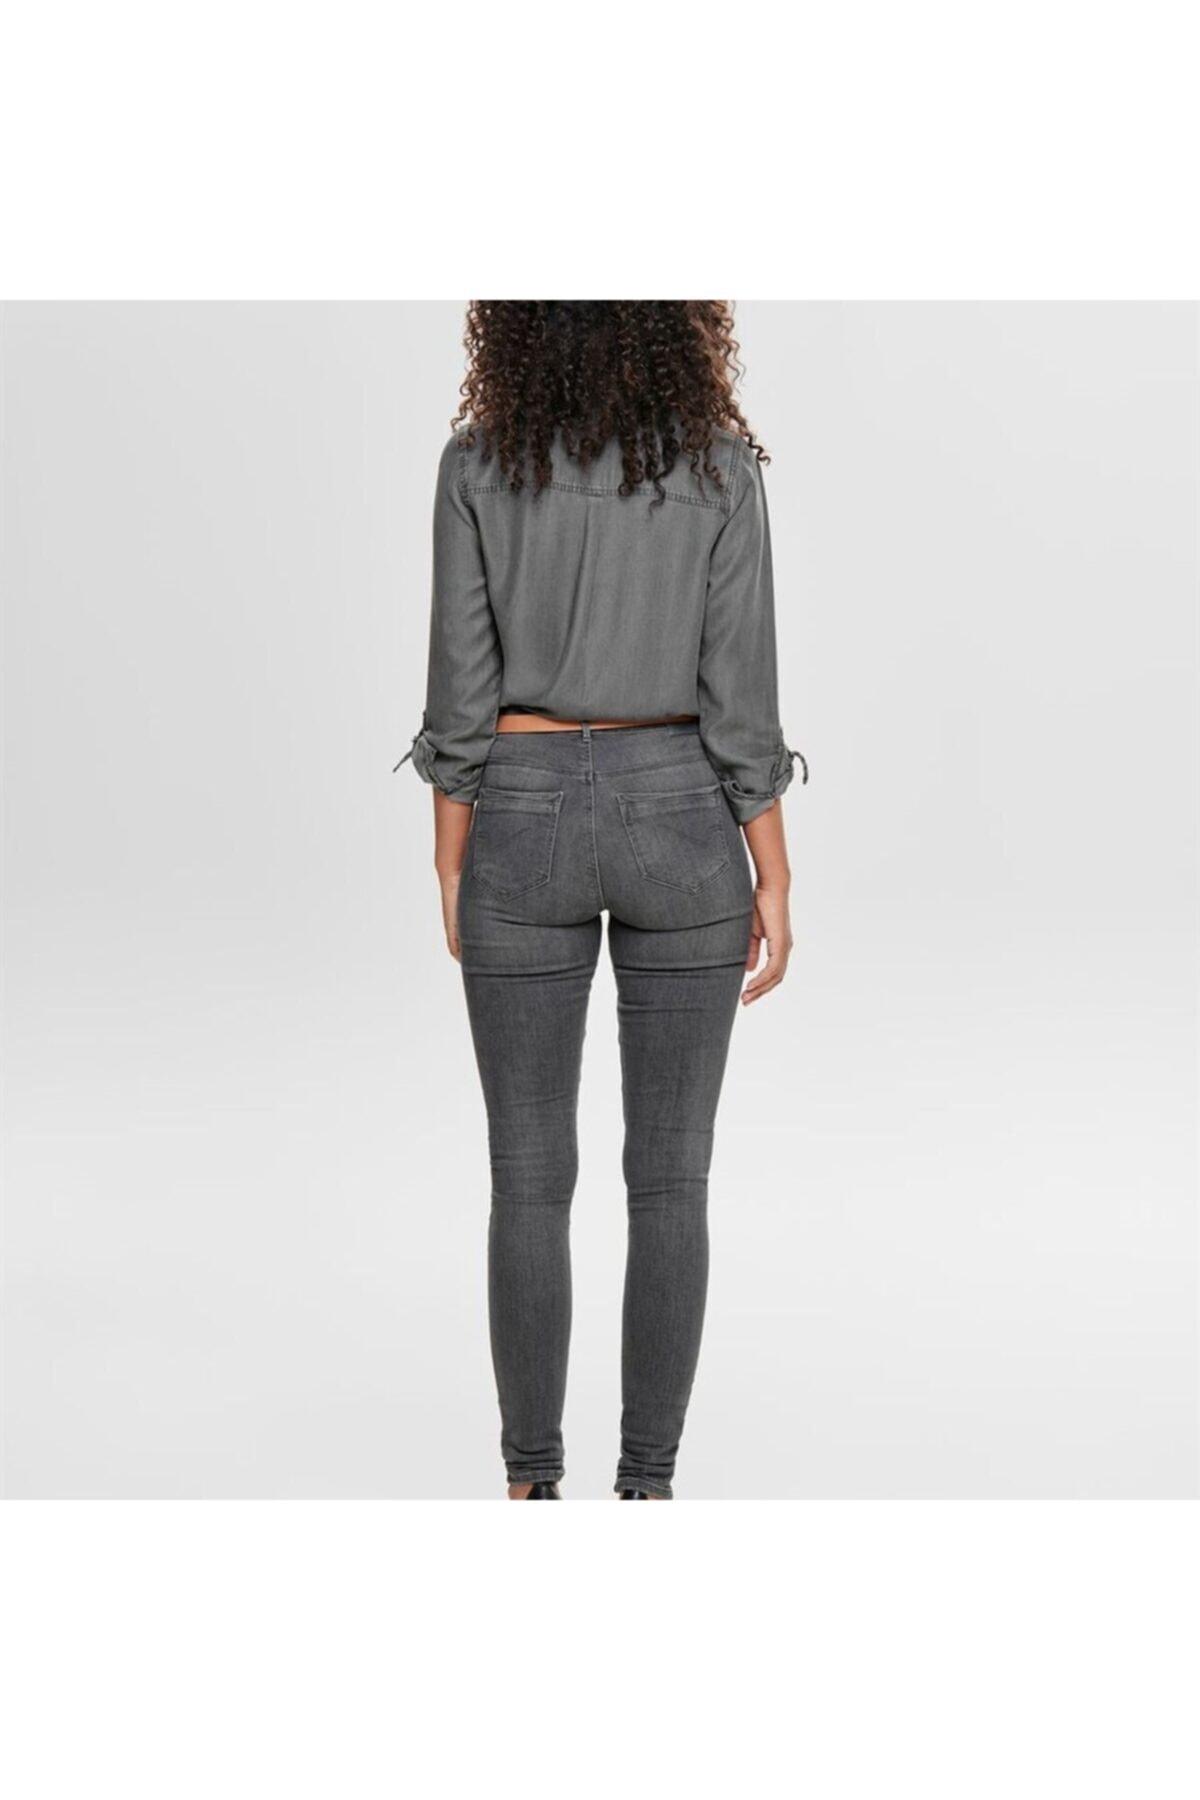 Only Kadın Gri Onlpaola Highwaist Sk Jeans - Bb Azz870 Noos 2